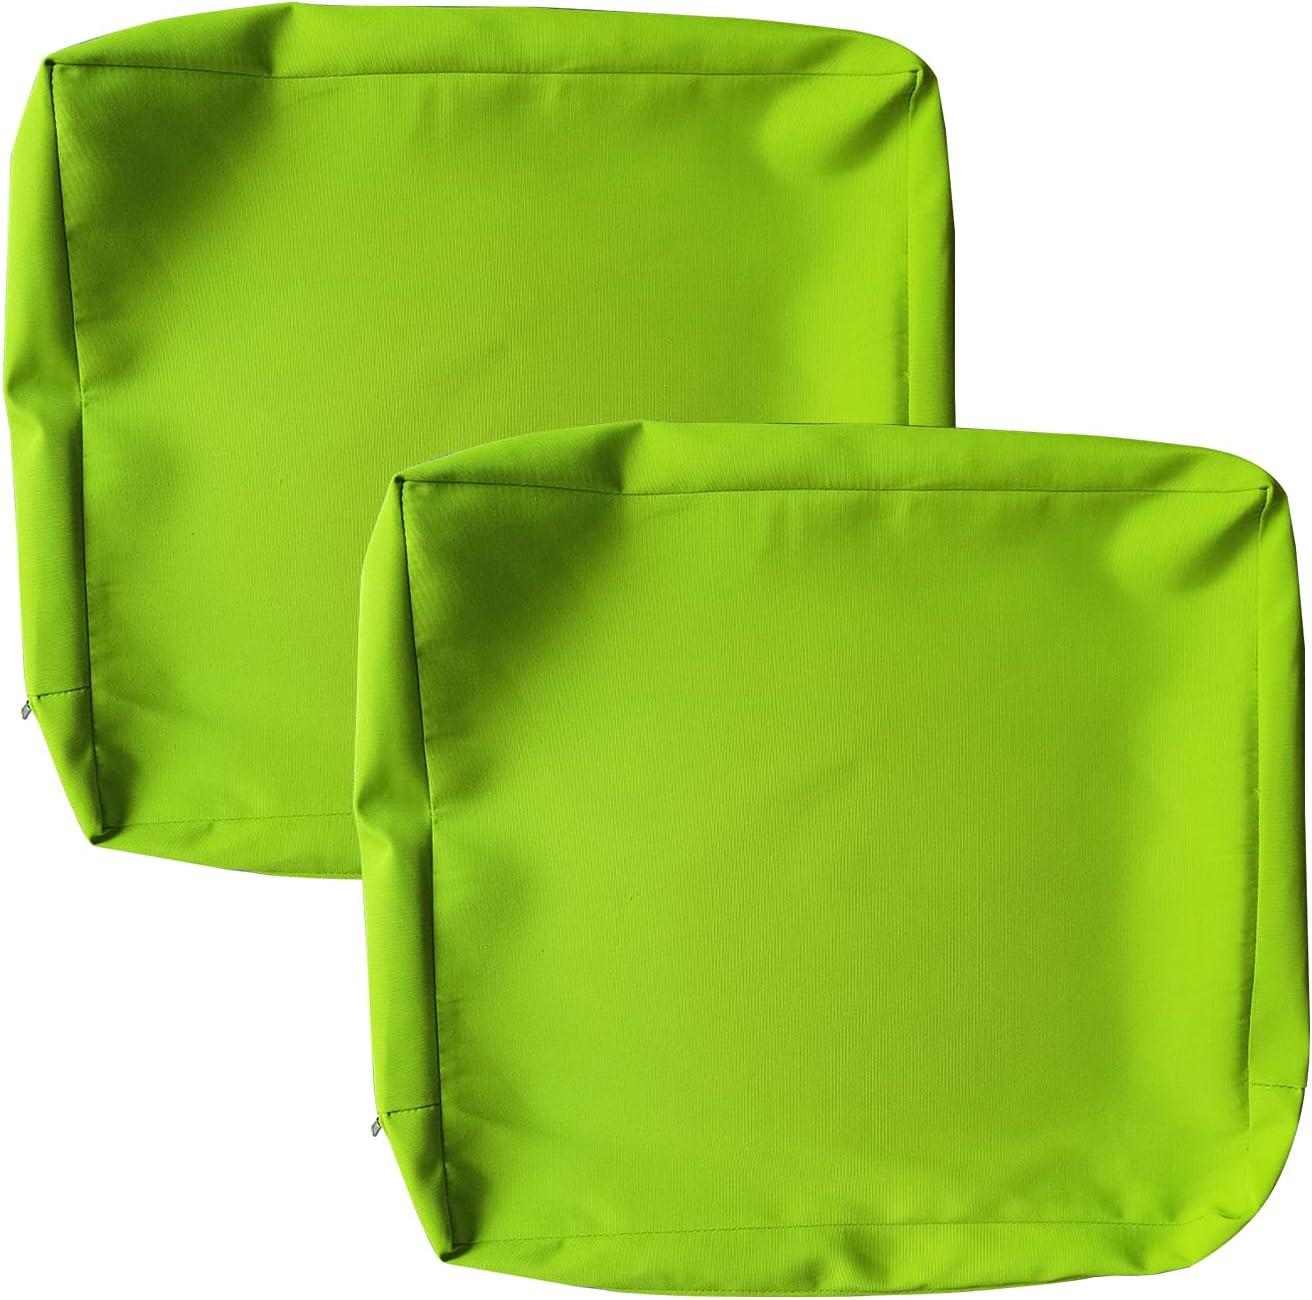 Cinnamonee Patio Cushion Covers Water Repellent 22